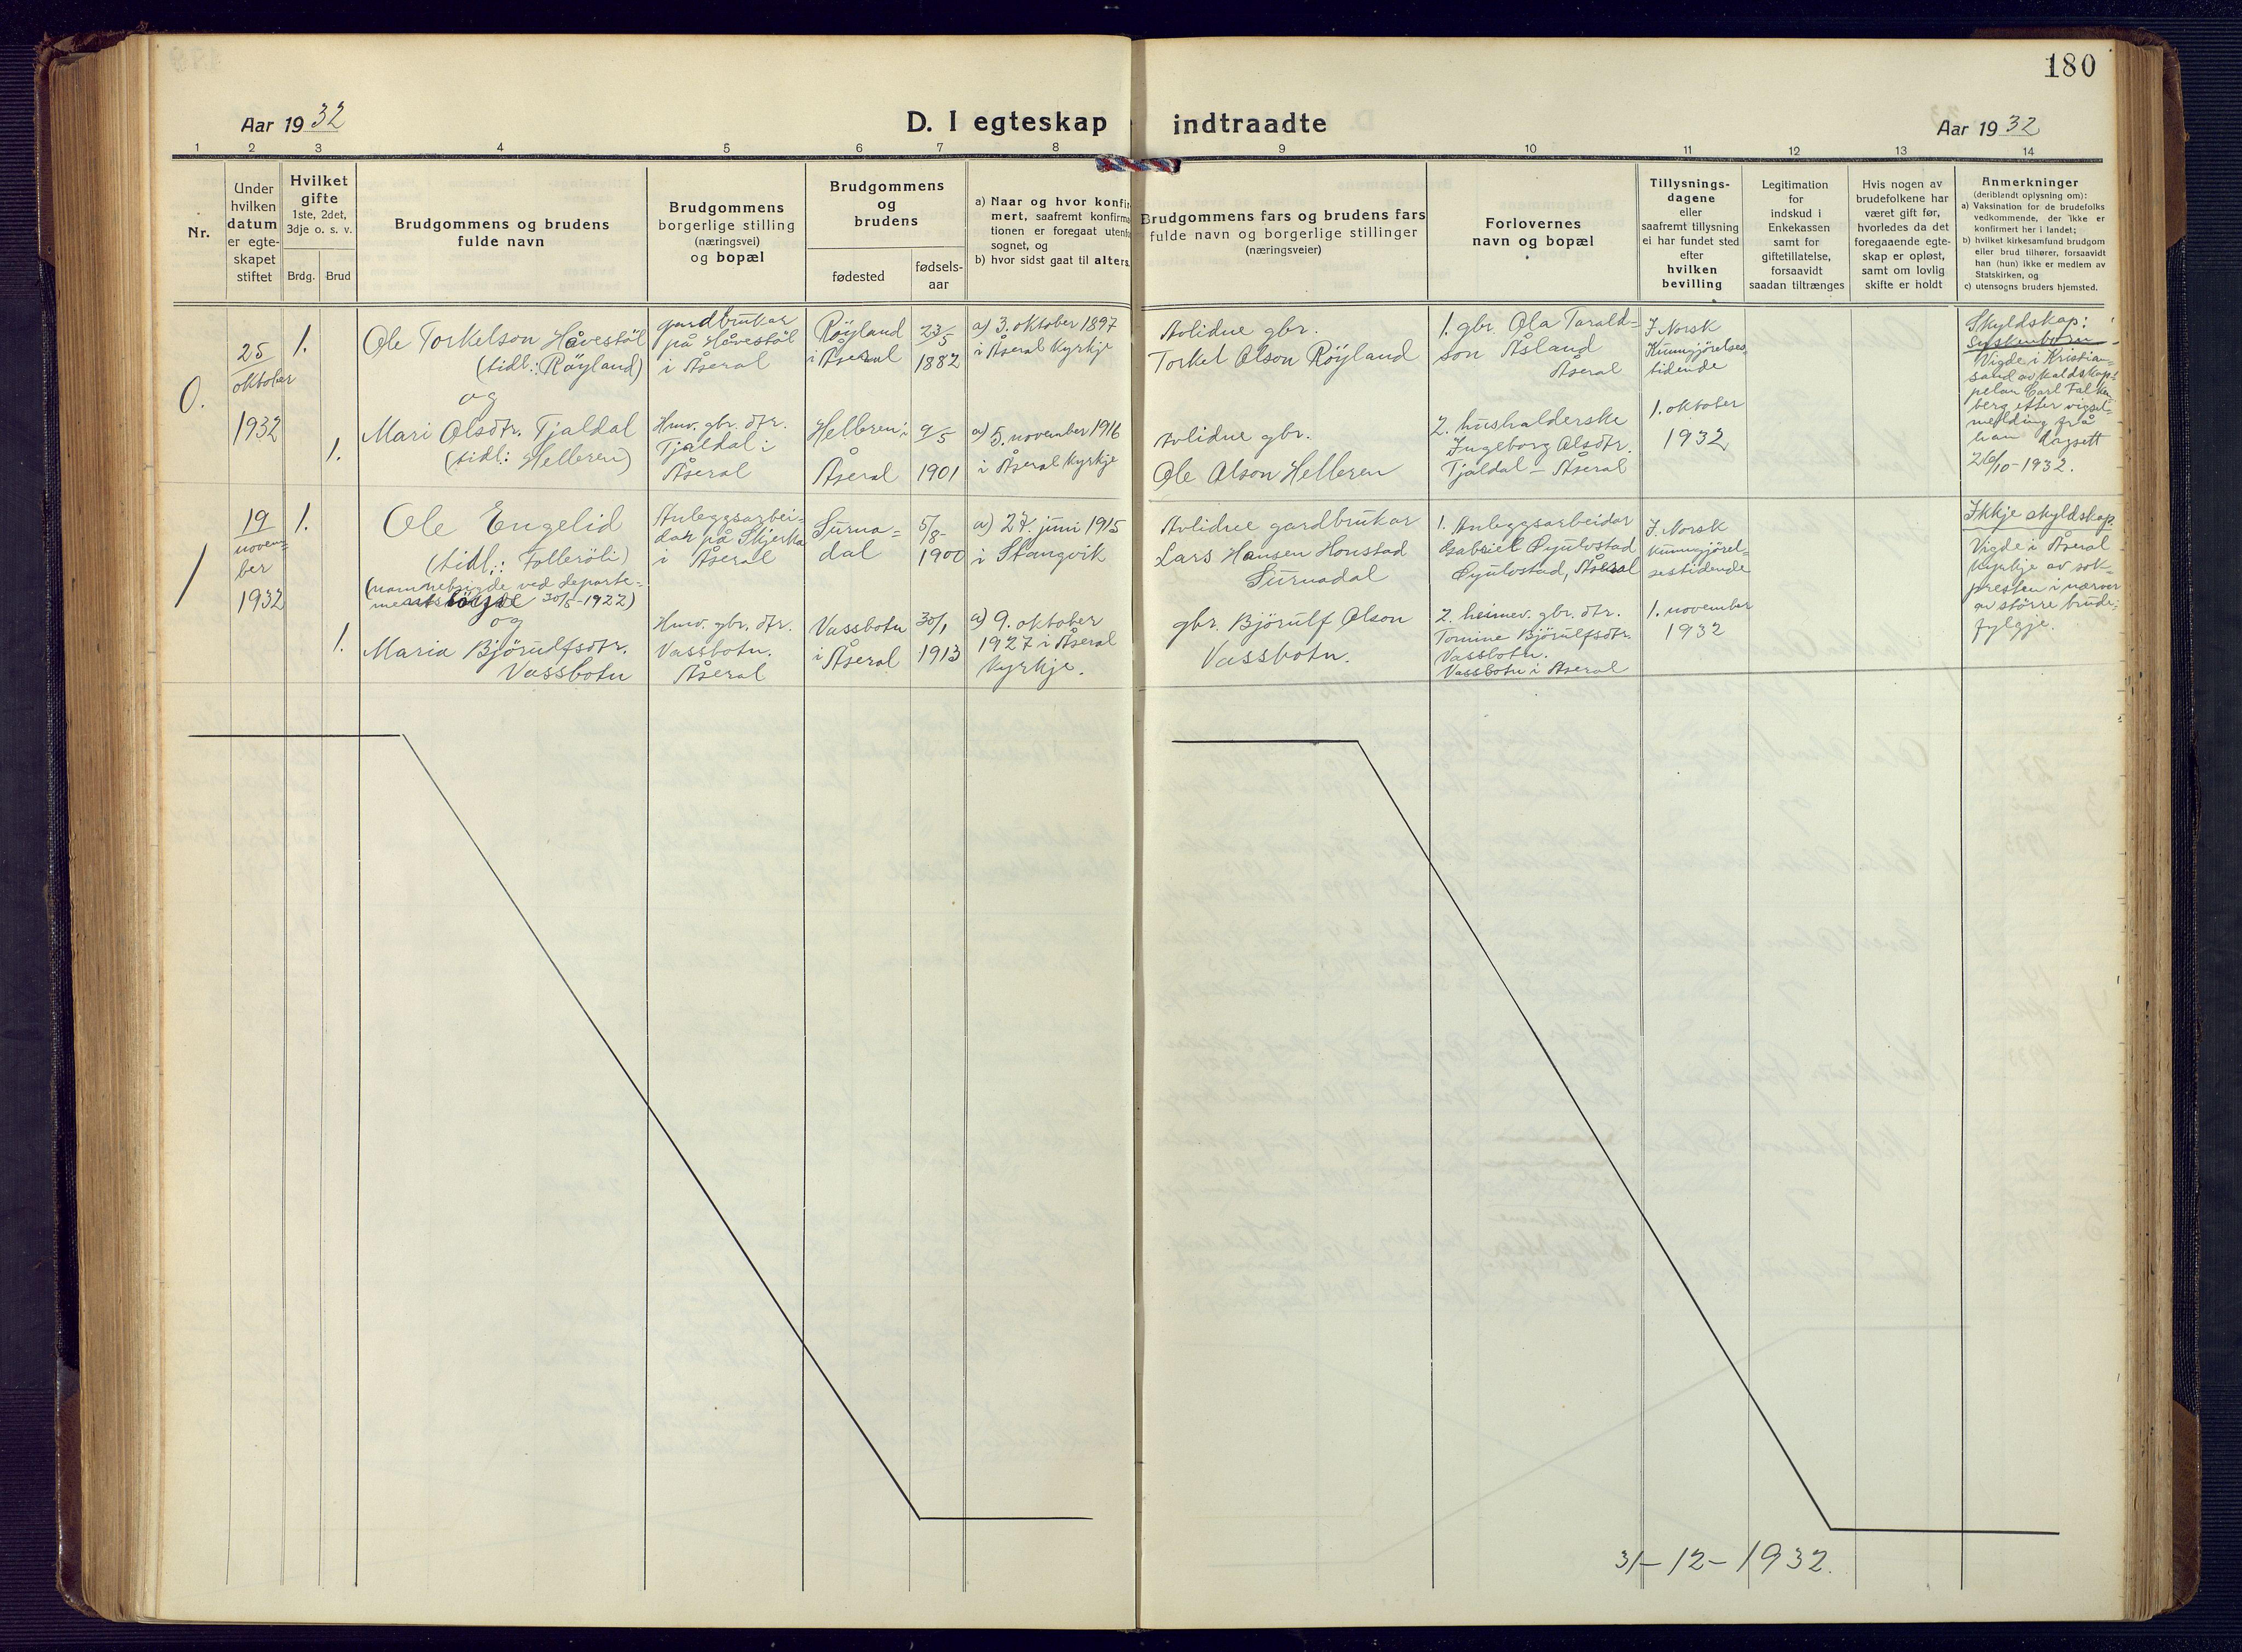 SAK, Åseral sokneprestkontor, F/Fb/L0004: Klokkerbok nr. B 4, 1920-1946, s. 180